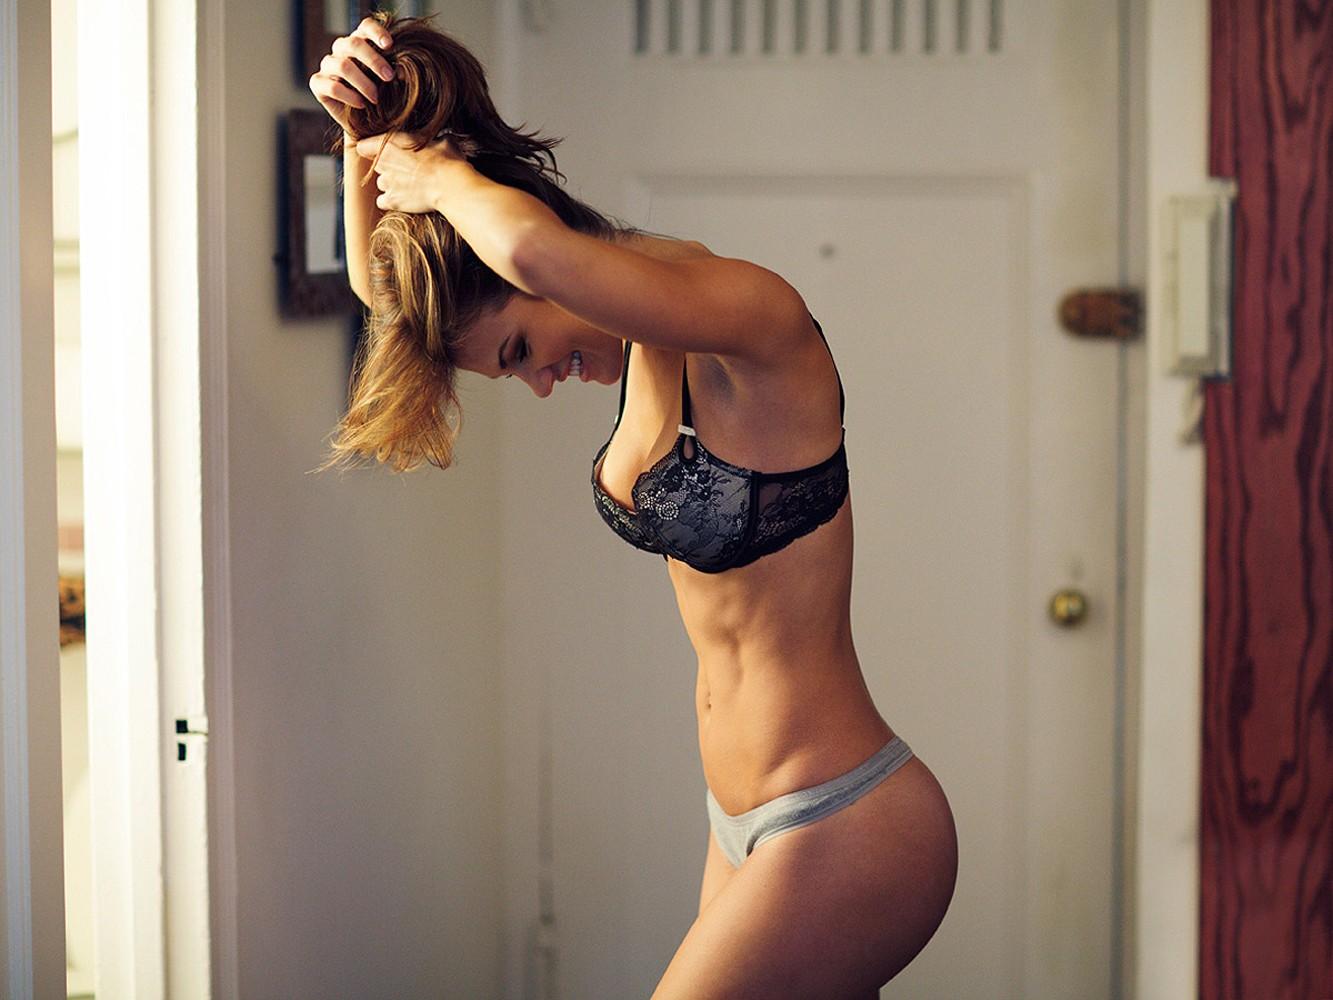 Фото самое шикарное тело девушки 4 фотография